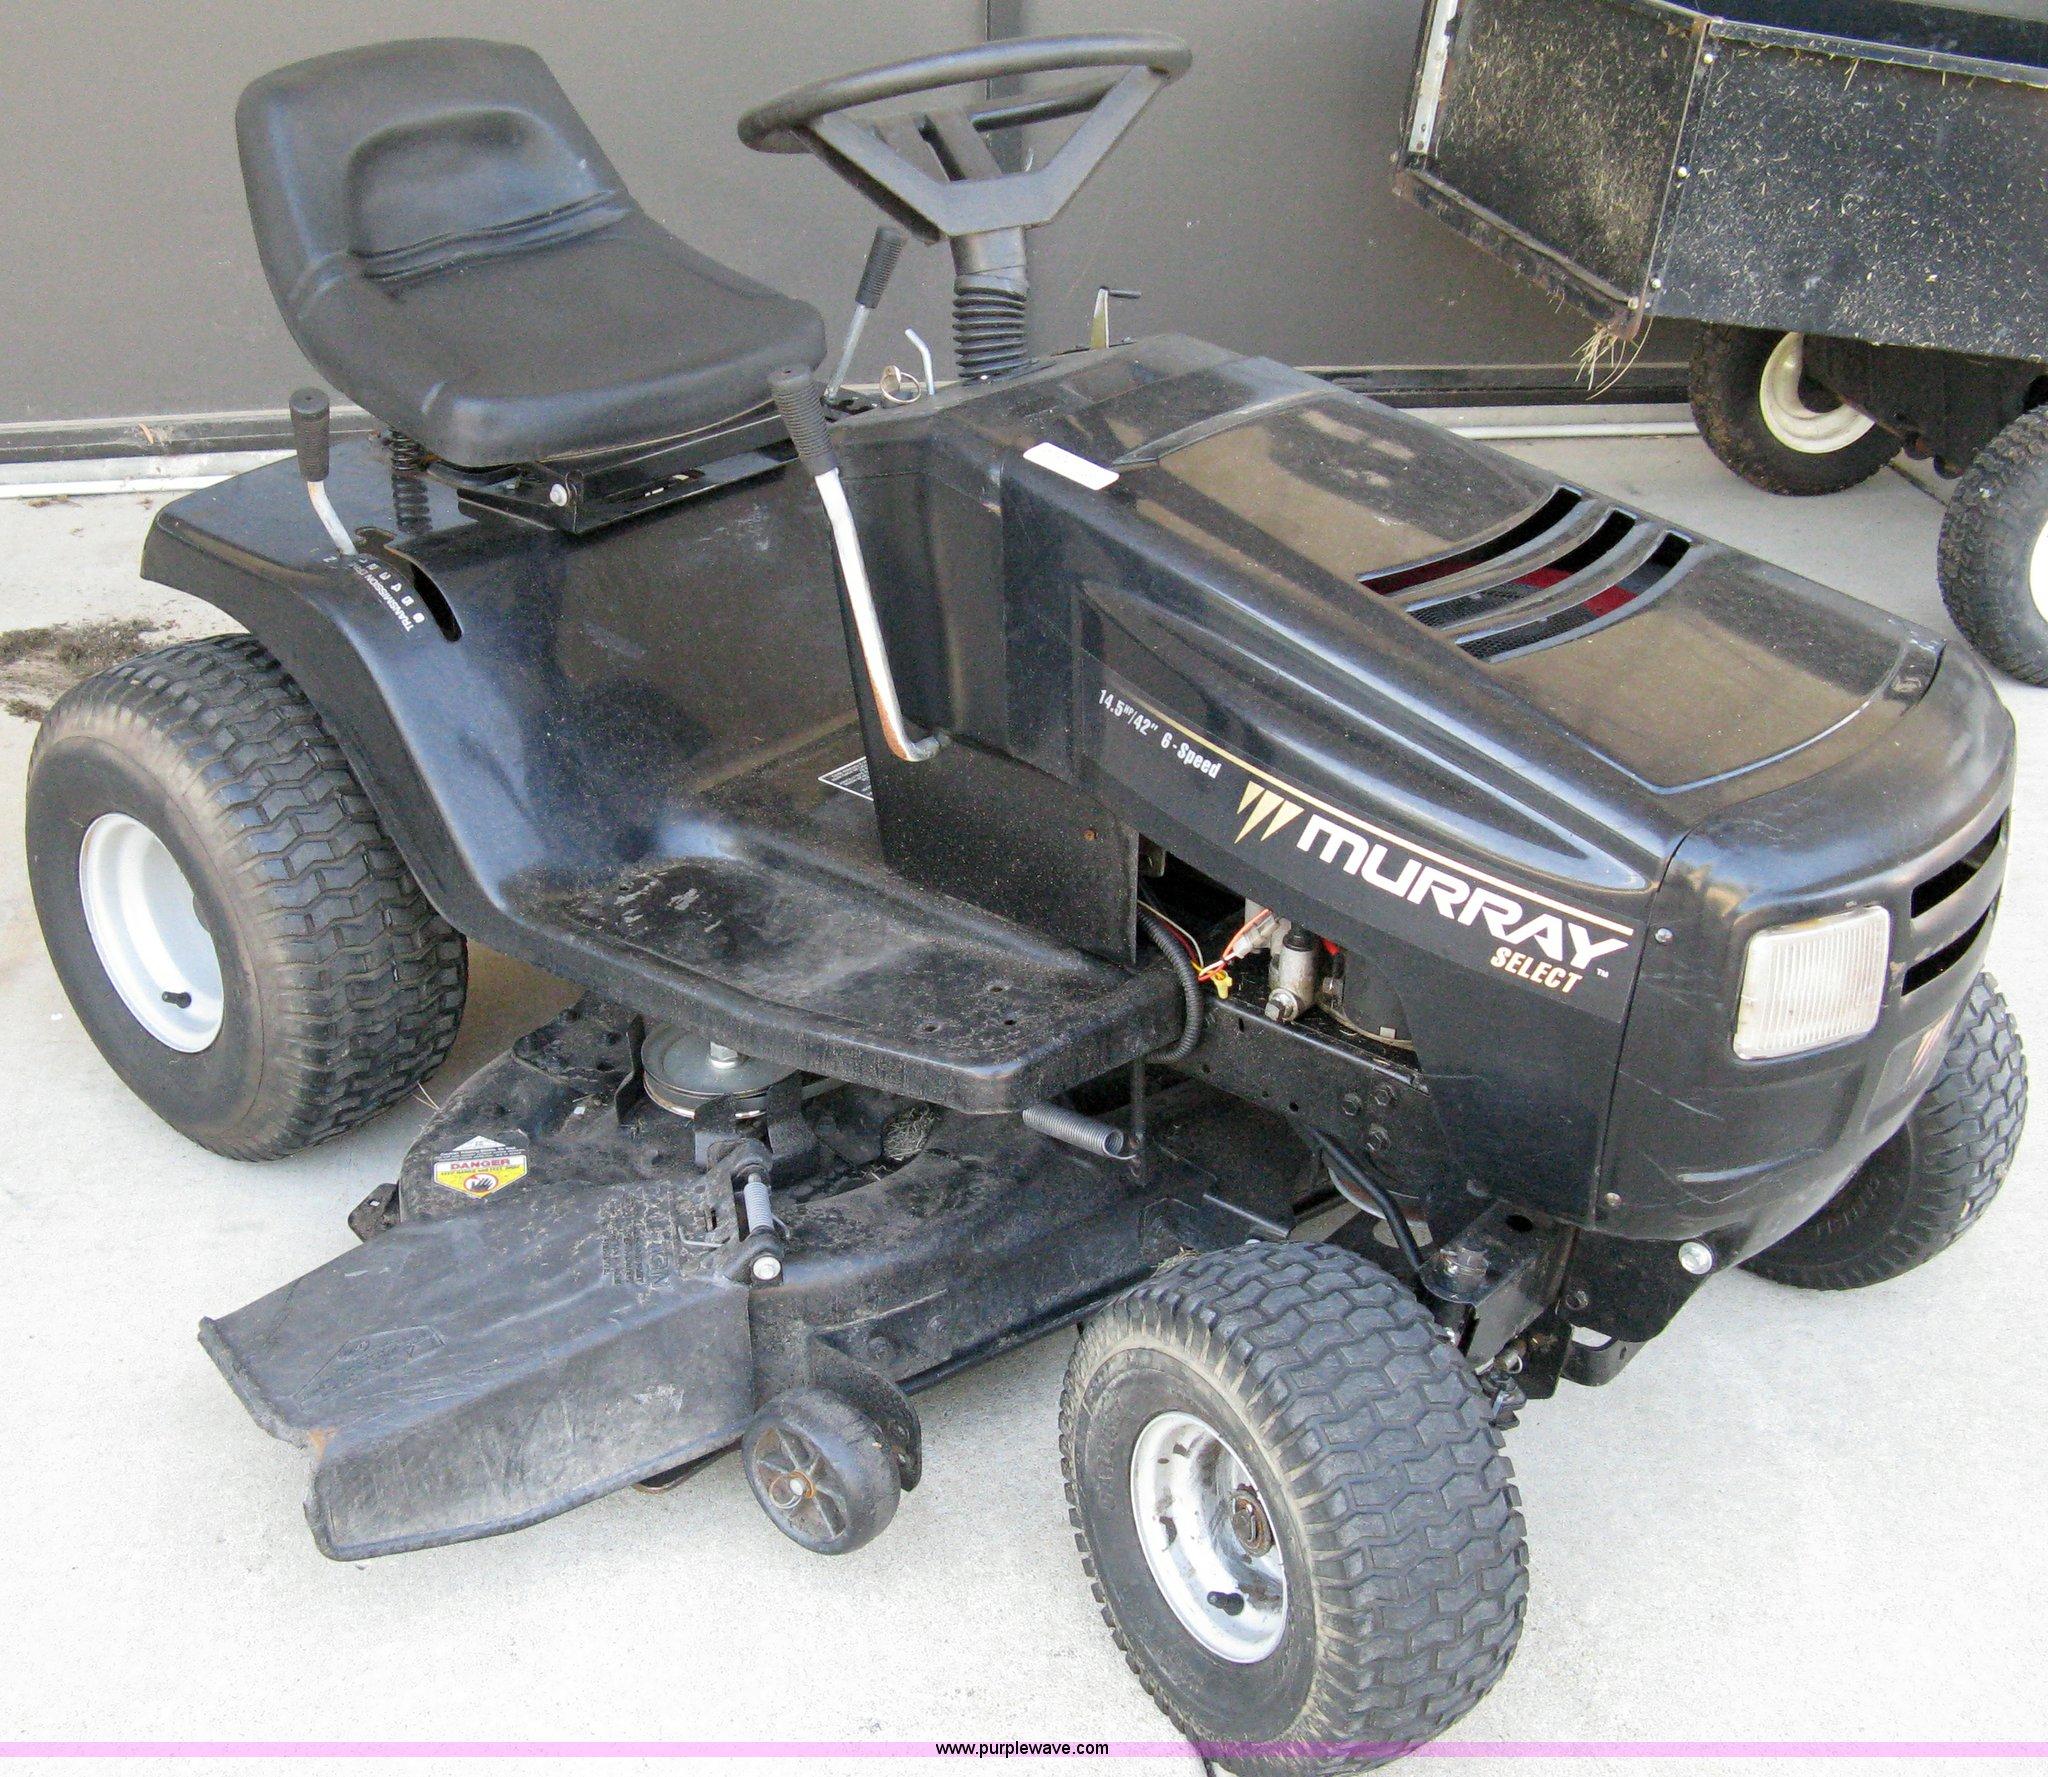 Murray Select Riding Mower Wiring Diagram And Ebooks Mercedes Benz 1637400293 Actuator Item 5102 Sold September 8 M Rh Purplewave Com